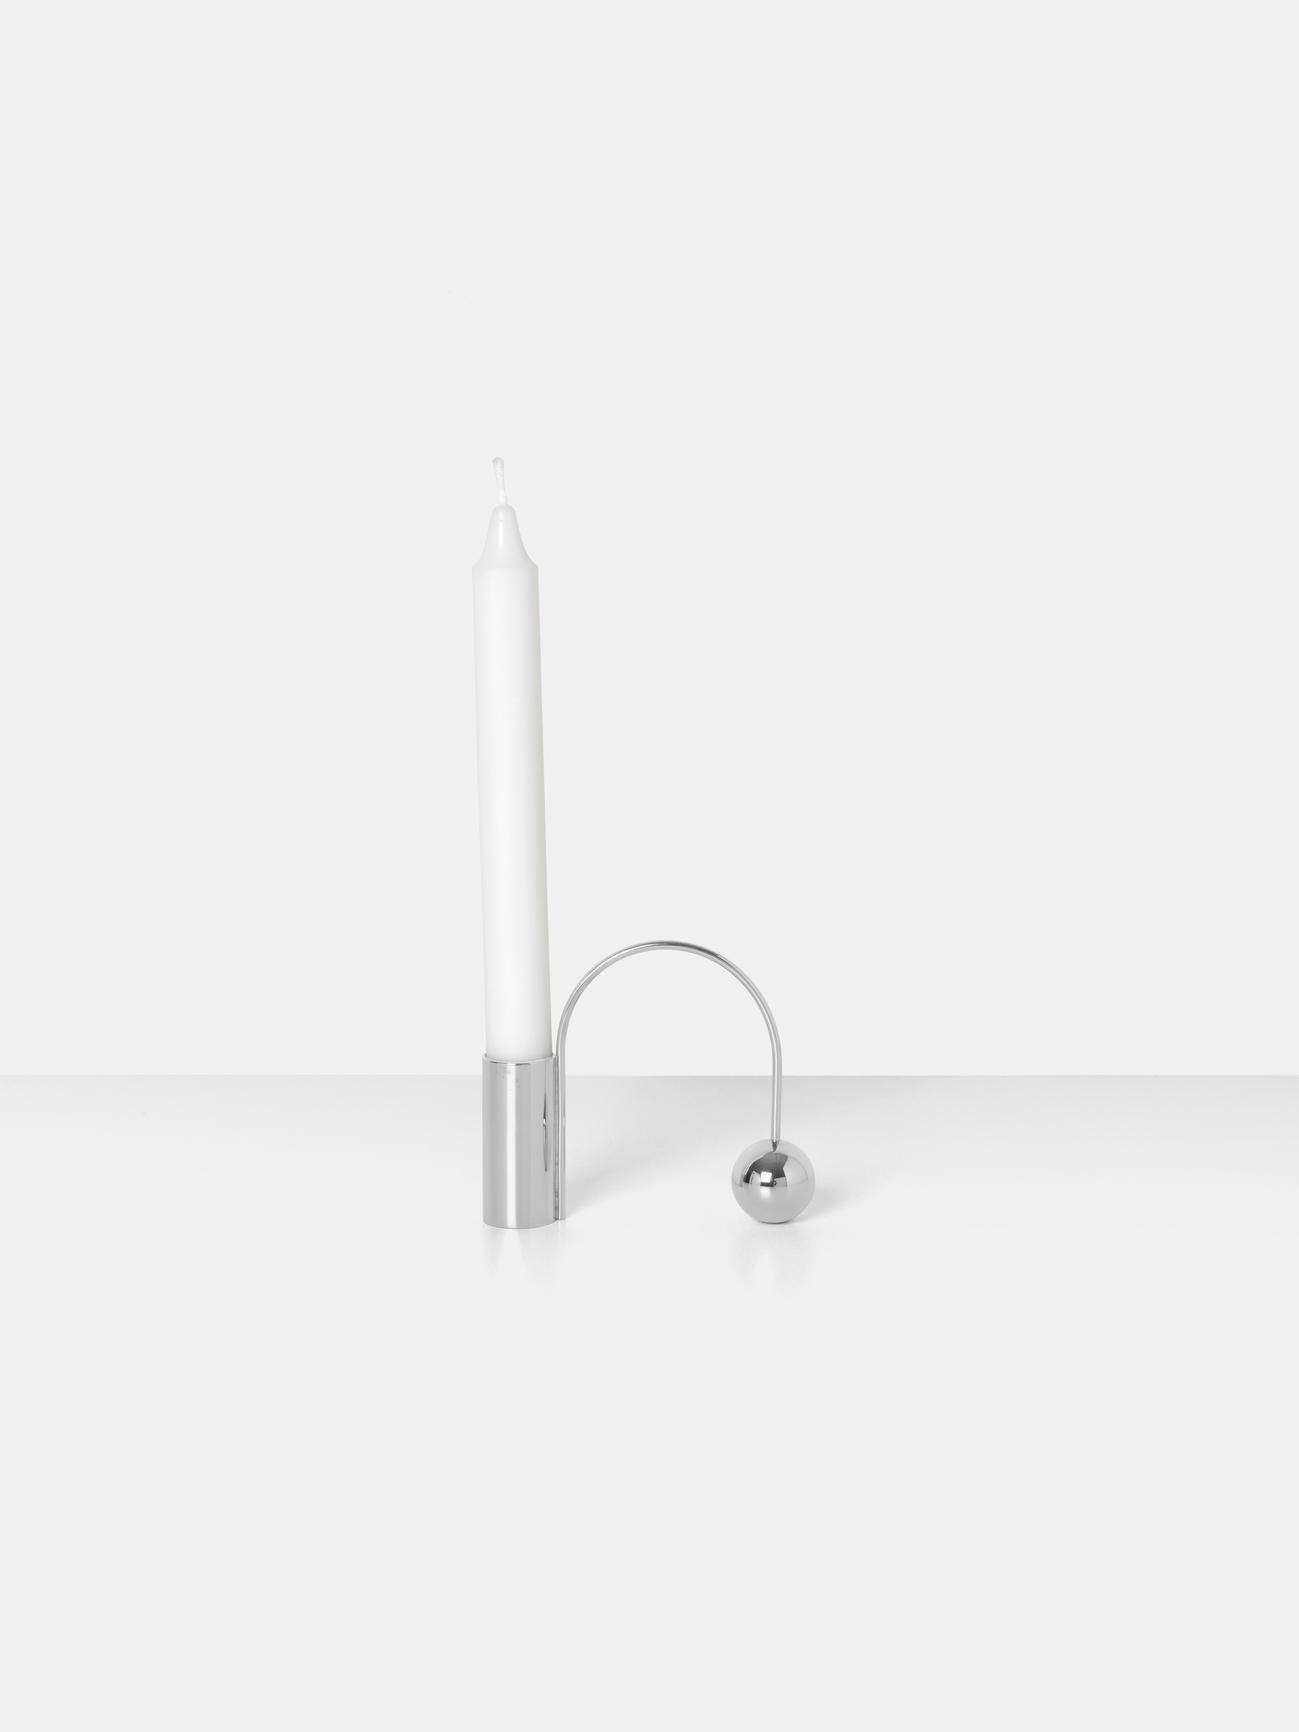 Ferm Living - Balance Candleholder (Chrome)